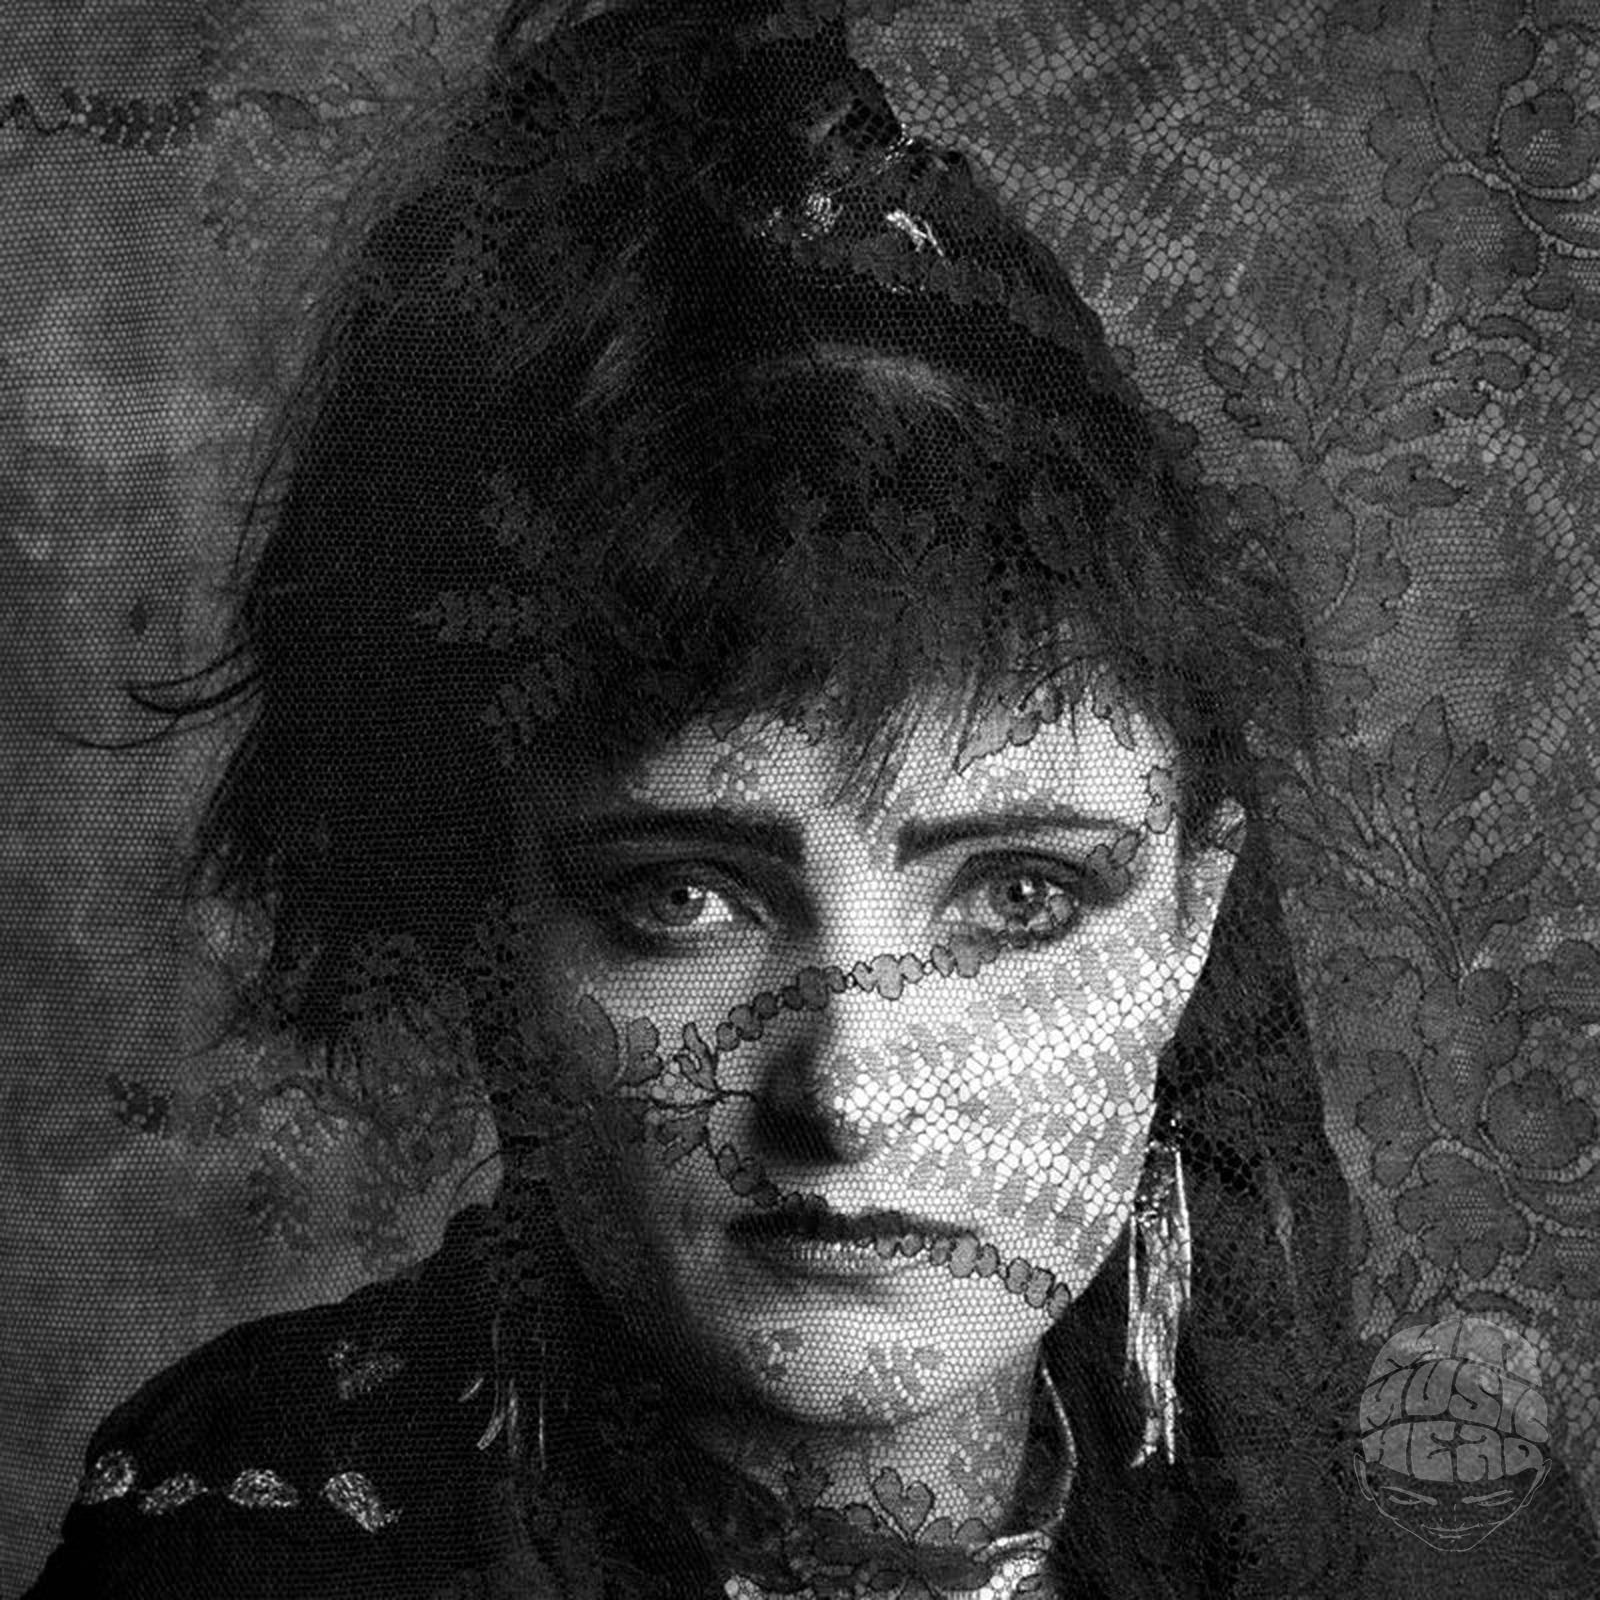 jay Blakesberg-- Siouxsie Sioux.jpg